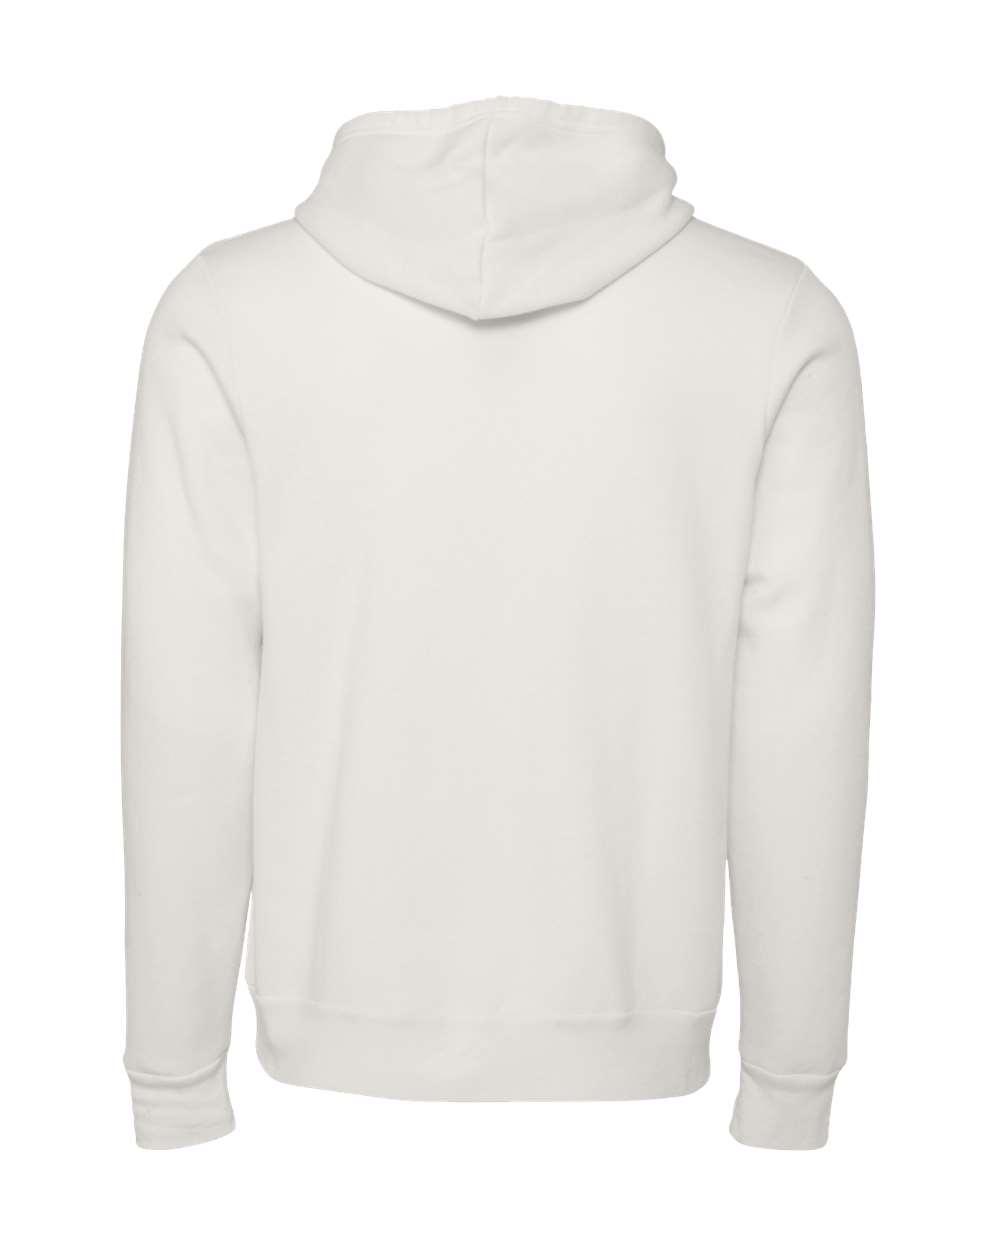 Bella-Canvas-Unisex-Sponge-Hooded-Pullover-Sweatshirt-Blank-3719-up-to-2XL thumbnail 101